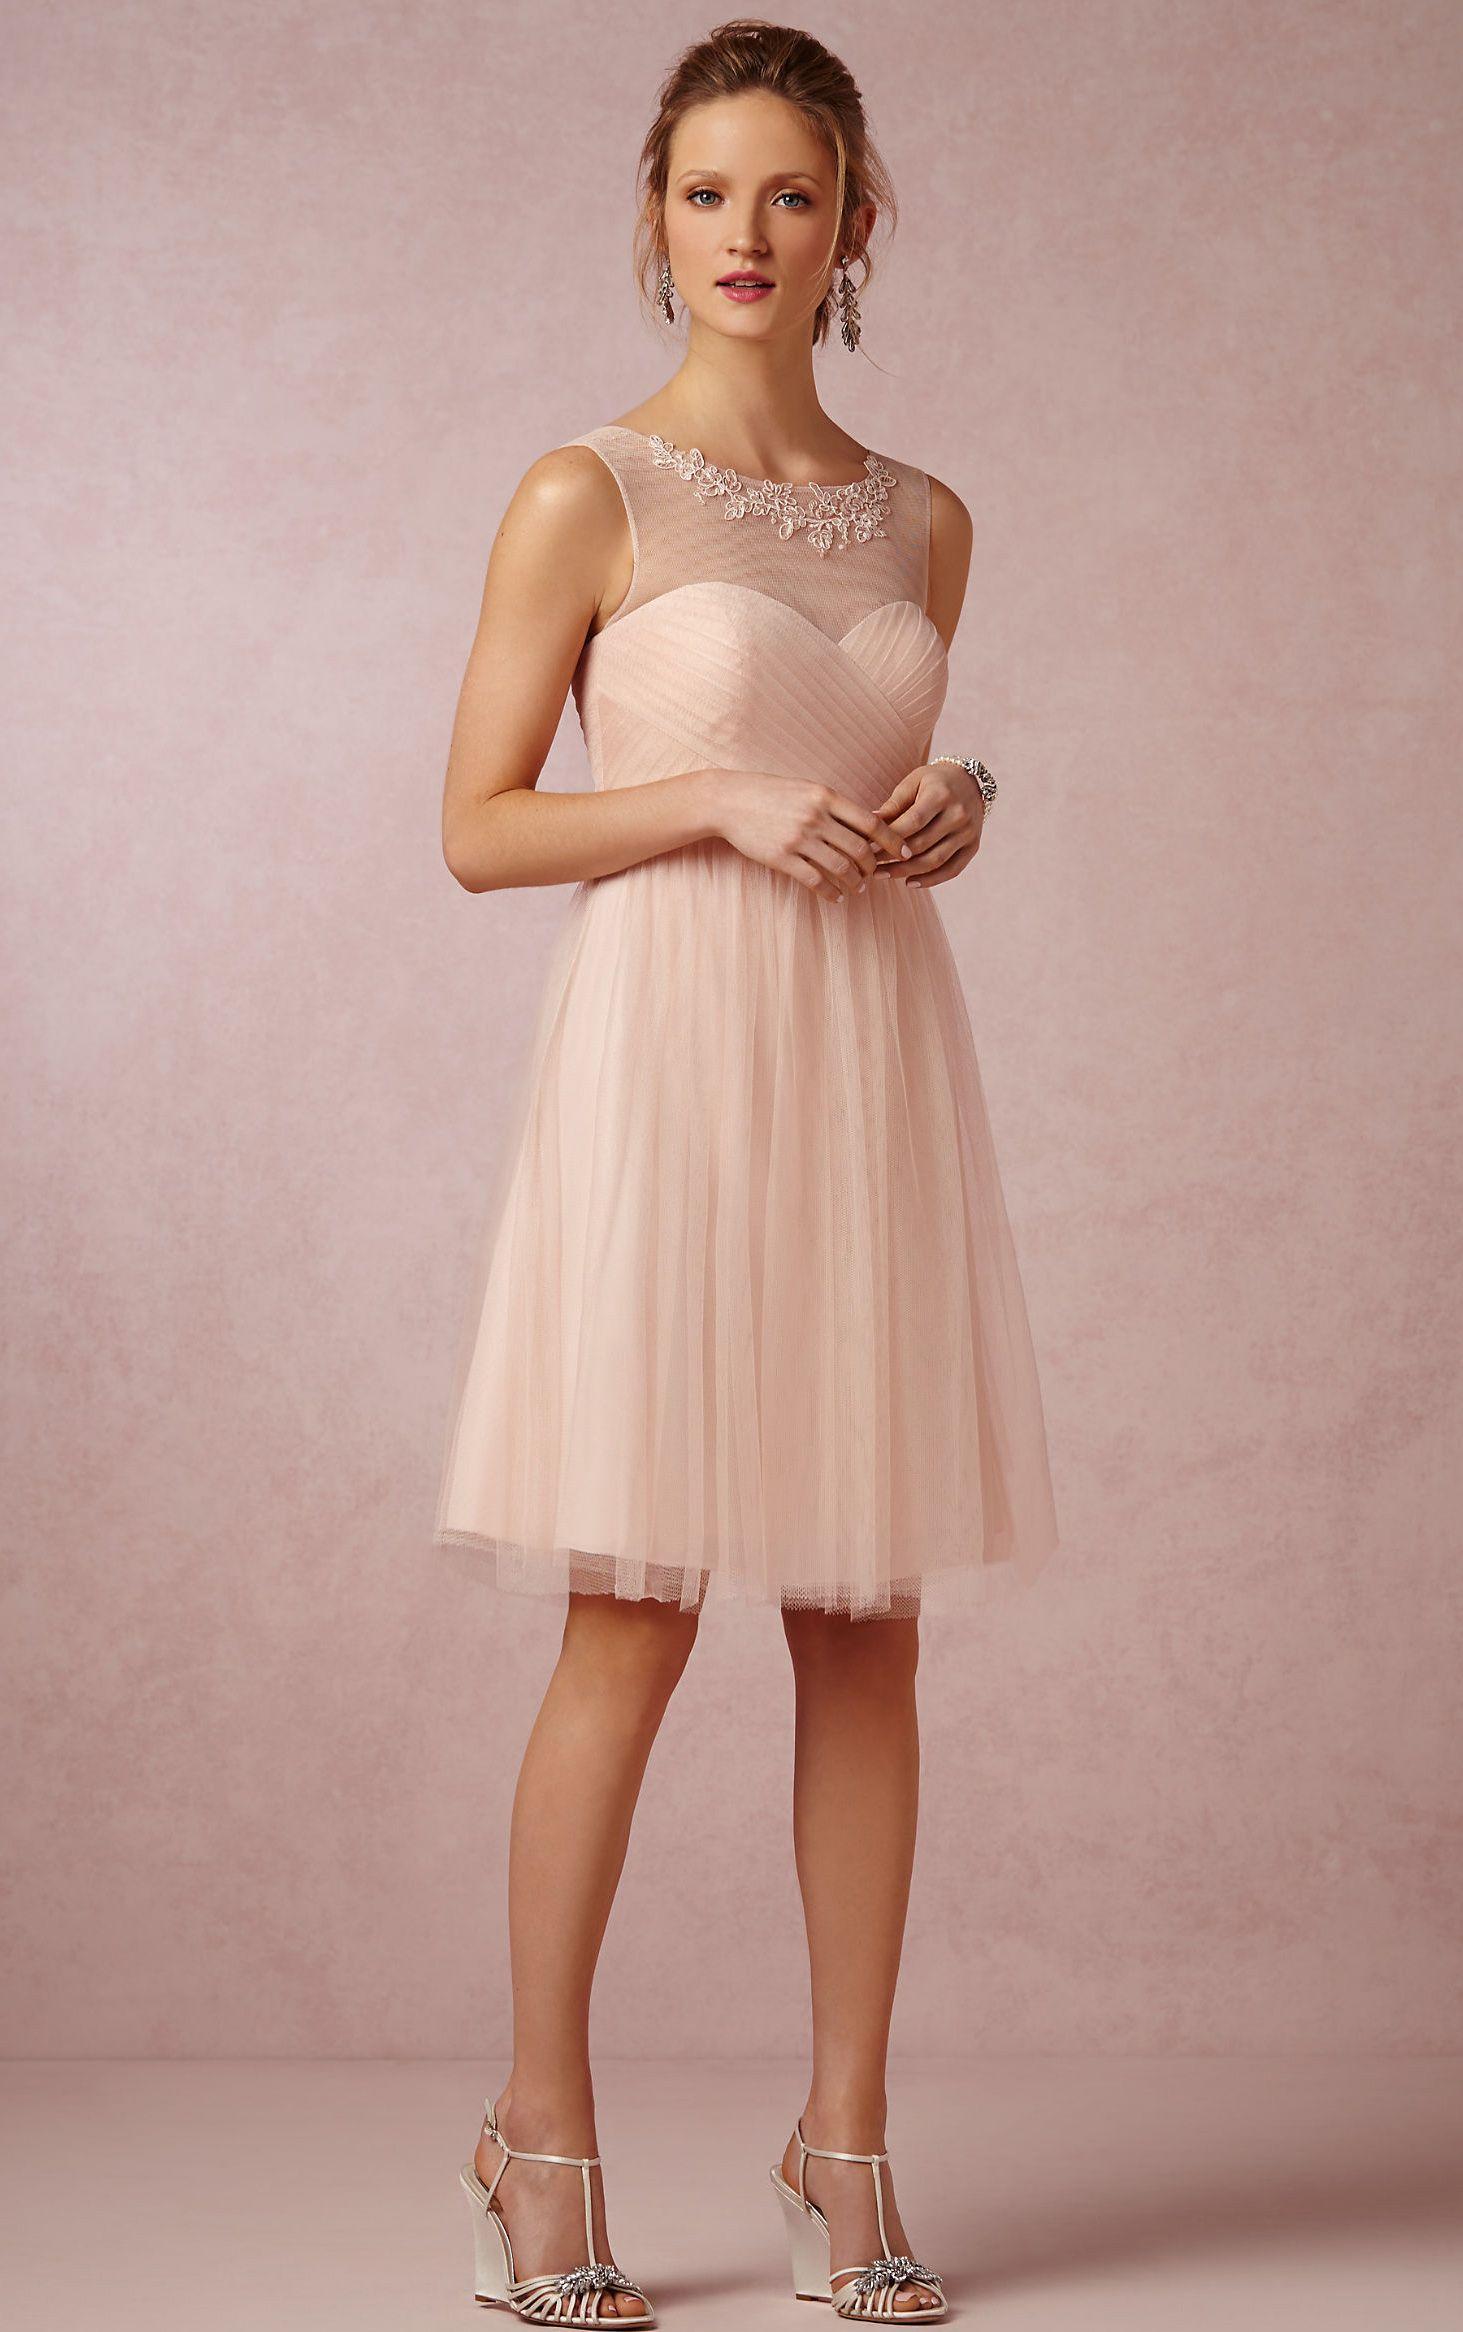 Cheap vintage style bridesmaid dresses uk